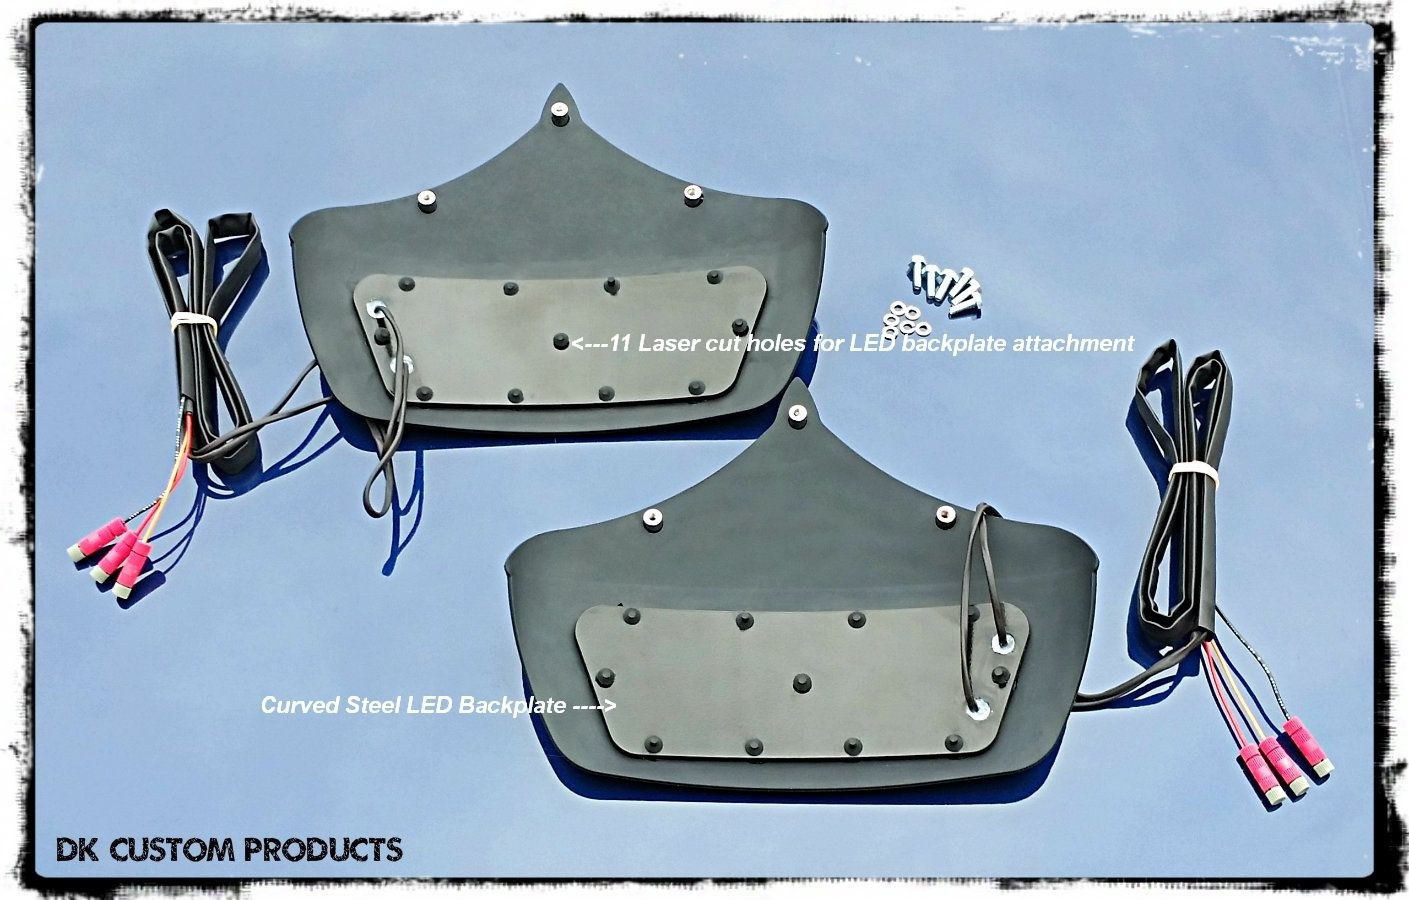 DK Custom Run-Brake- Turn LED Retrofit Kit for Tri-Glide Mud Flaps Harley-Davidson Kuryakyn RBT SEE AND BE SEEN